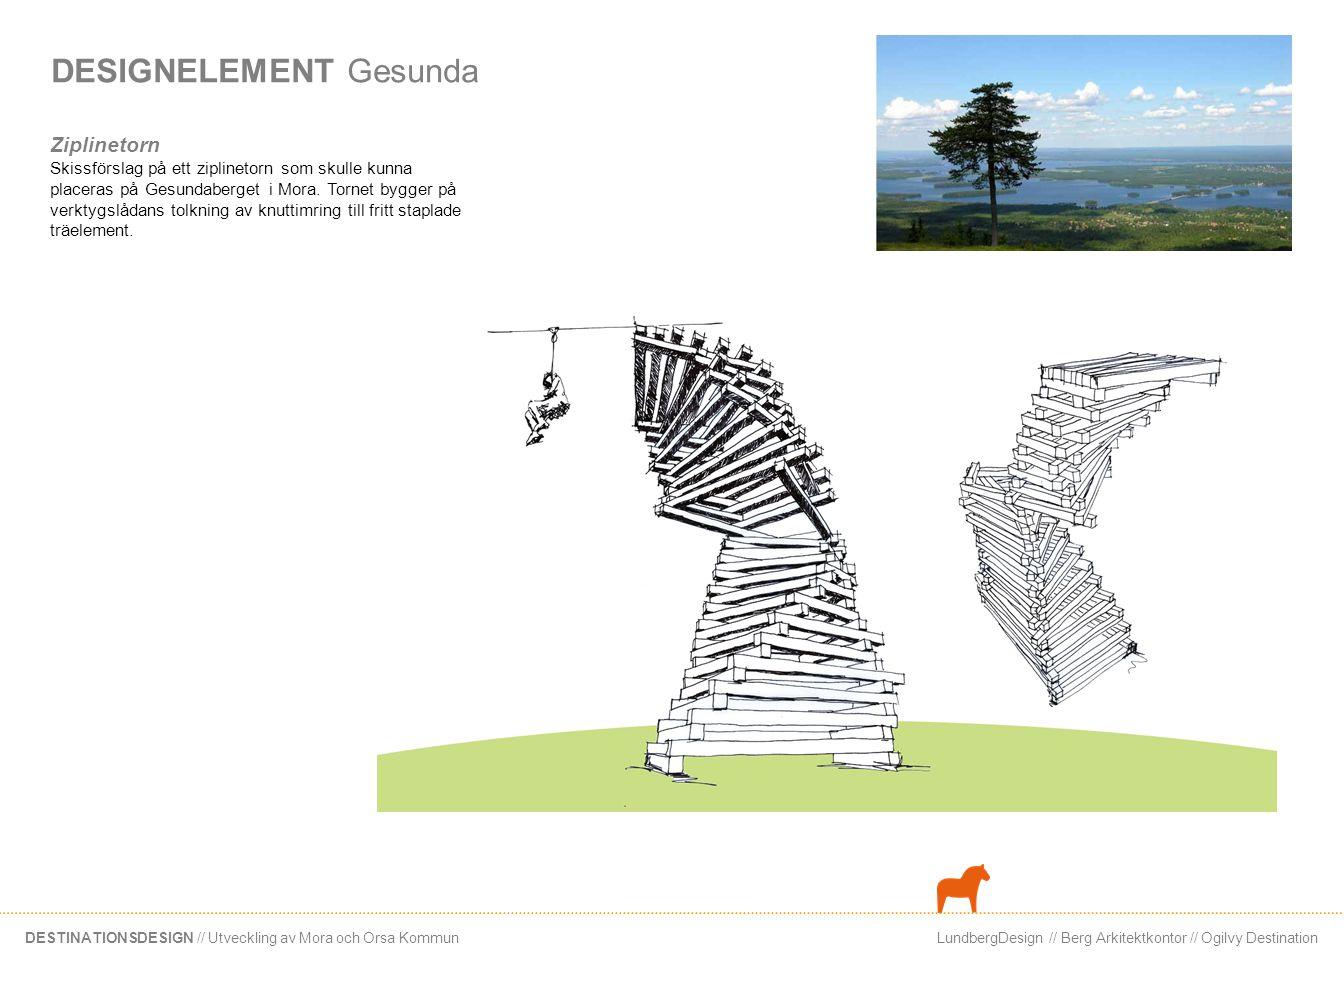 DESIGNELEMENT Gesunda